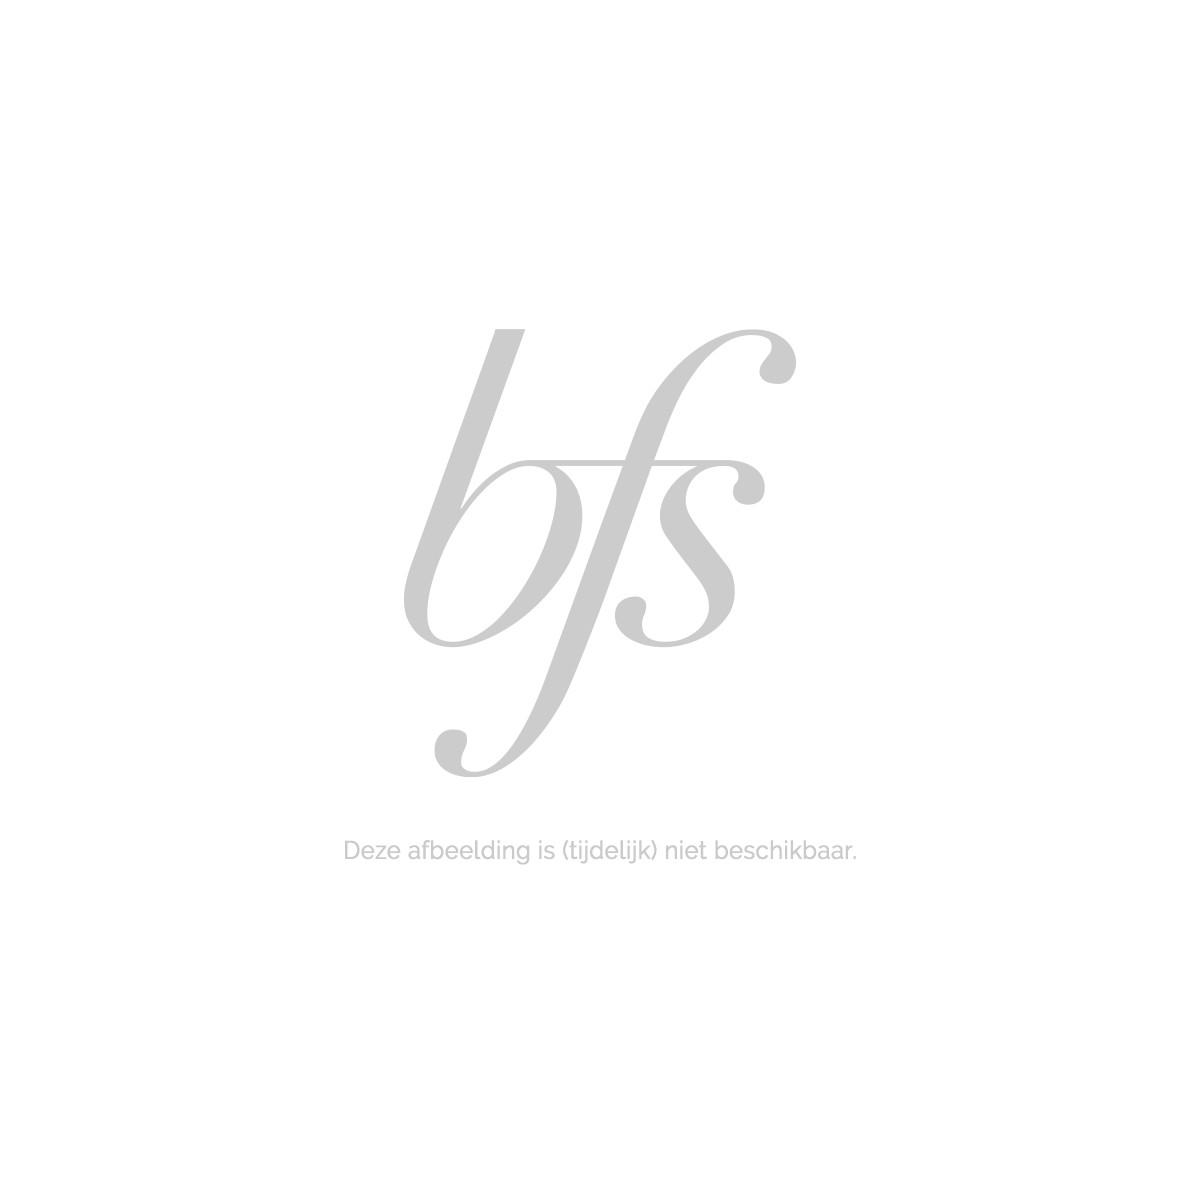 Anastasia Brush #7B Dual-Ended Angled Brush